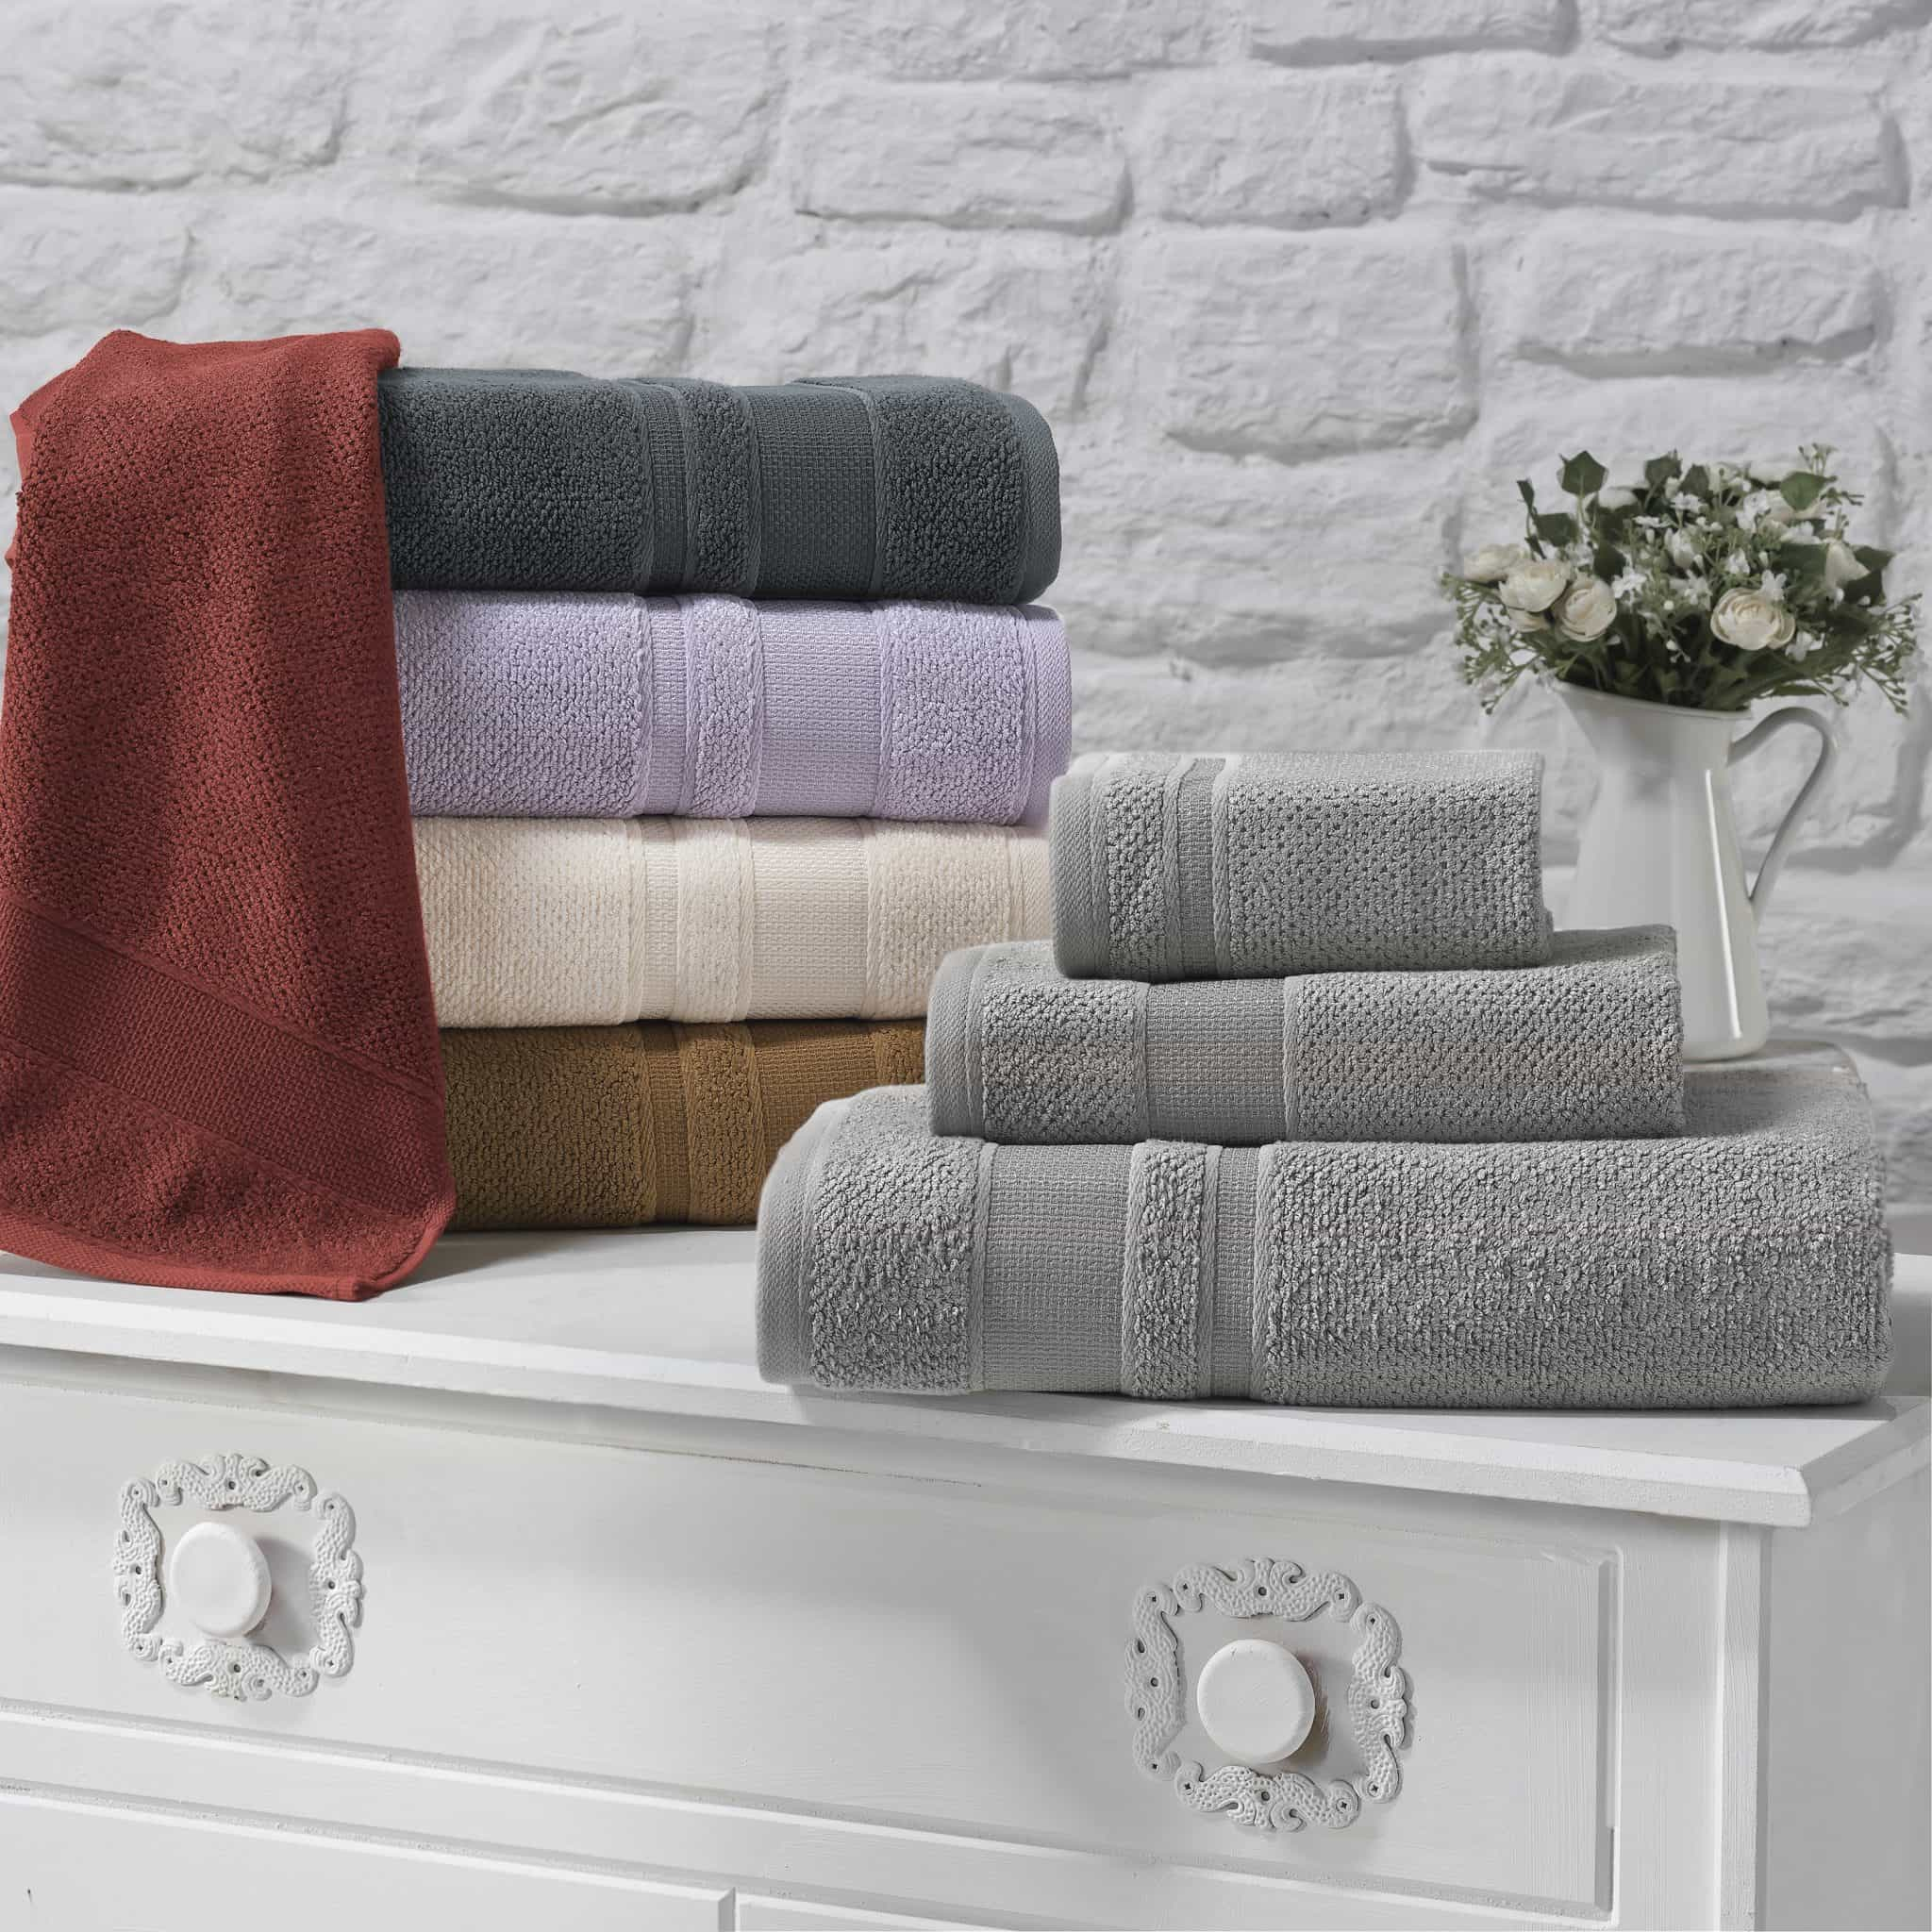 Modality Turkish Towels 2 Enchante Home